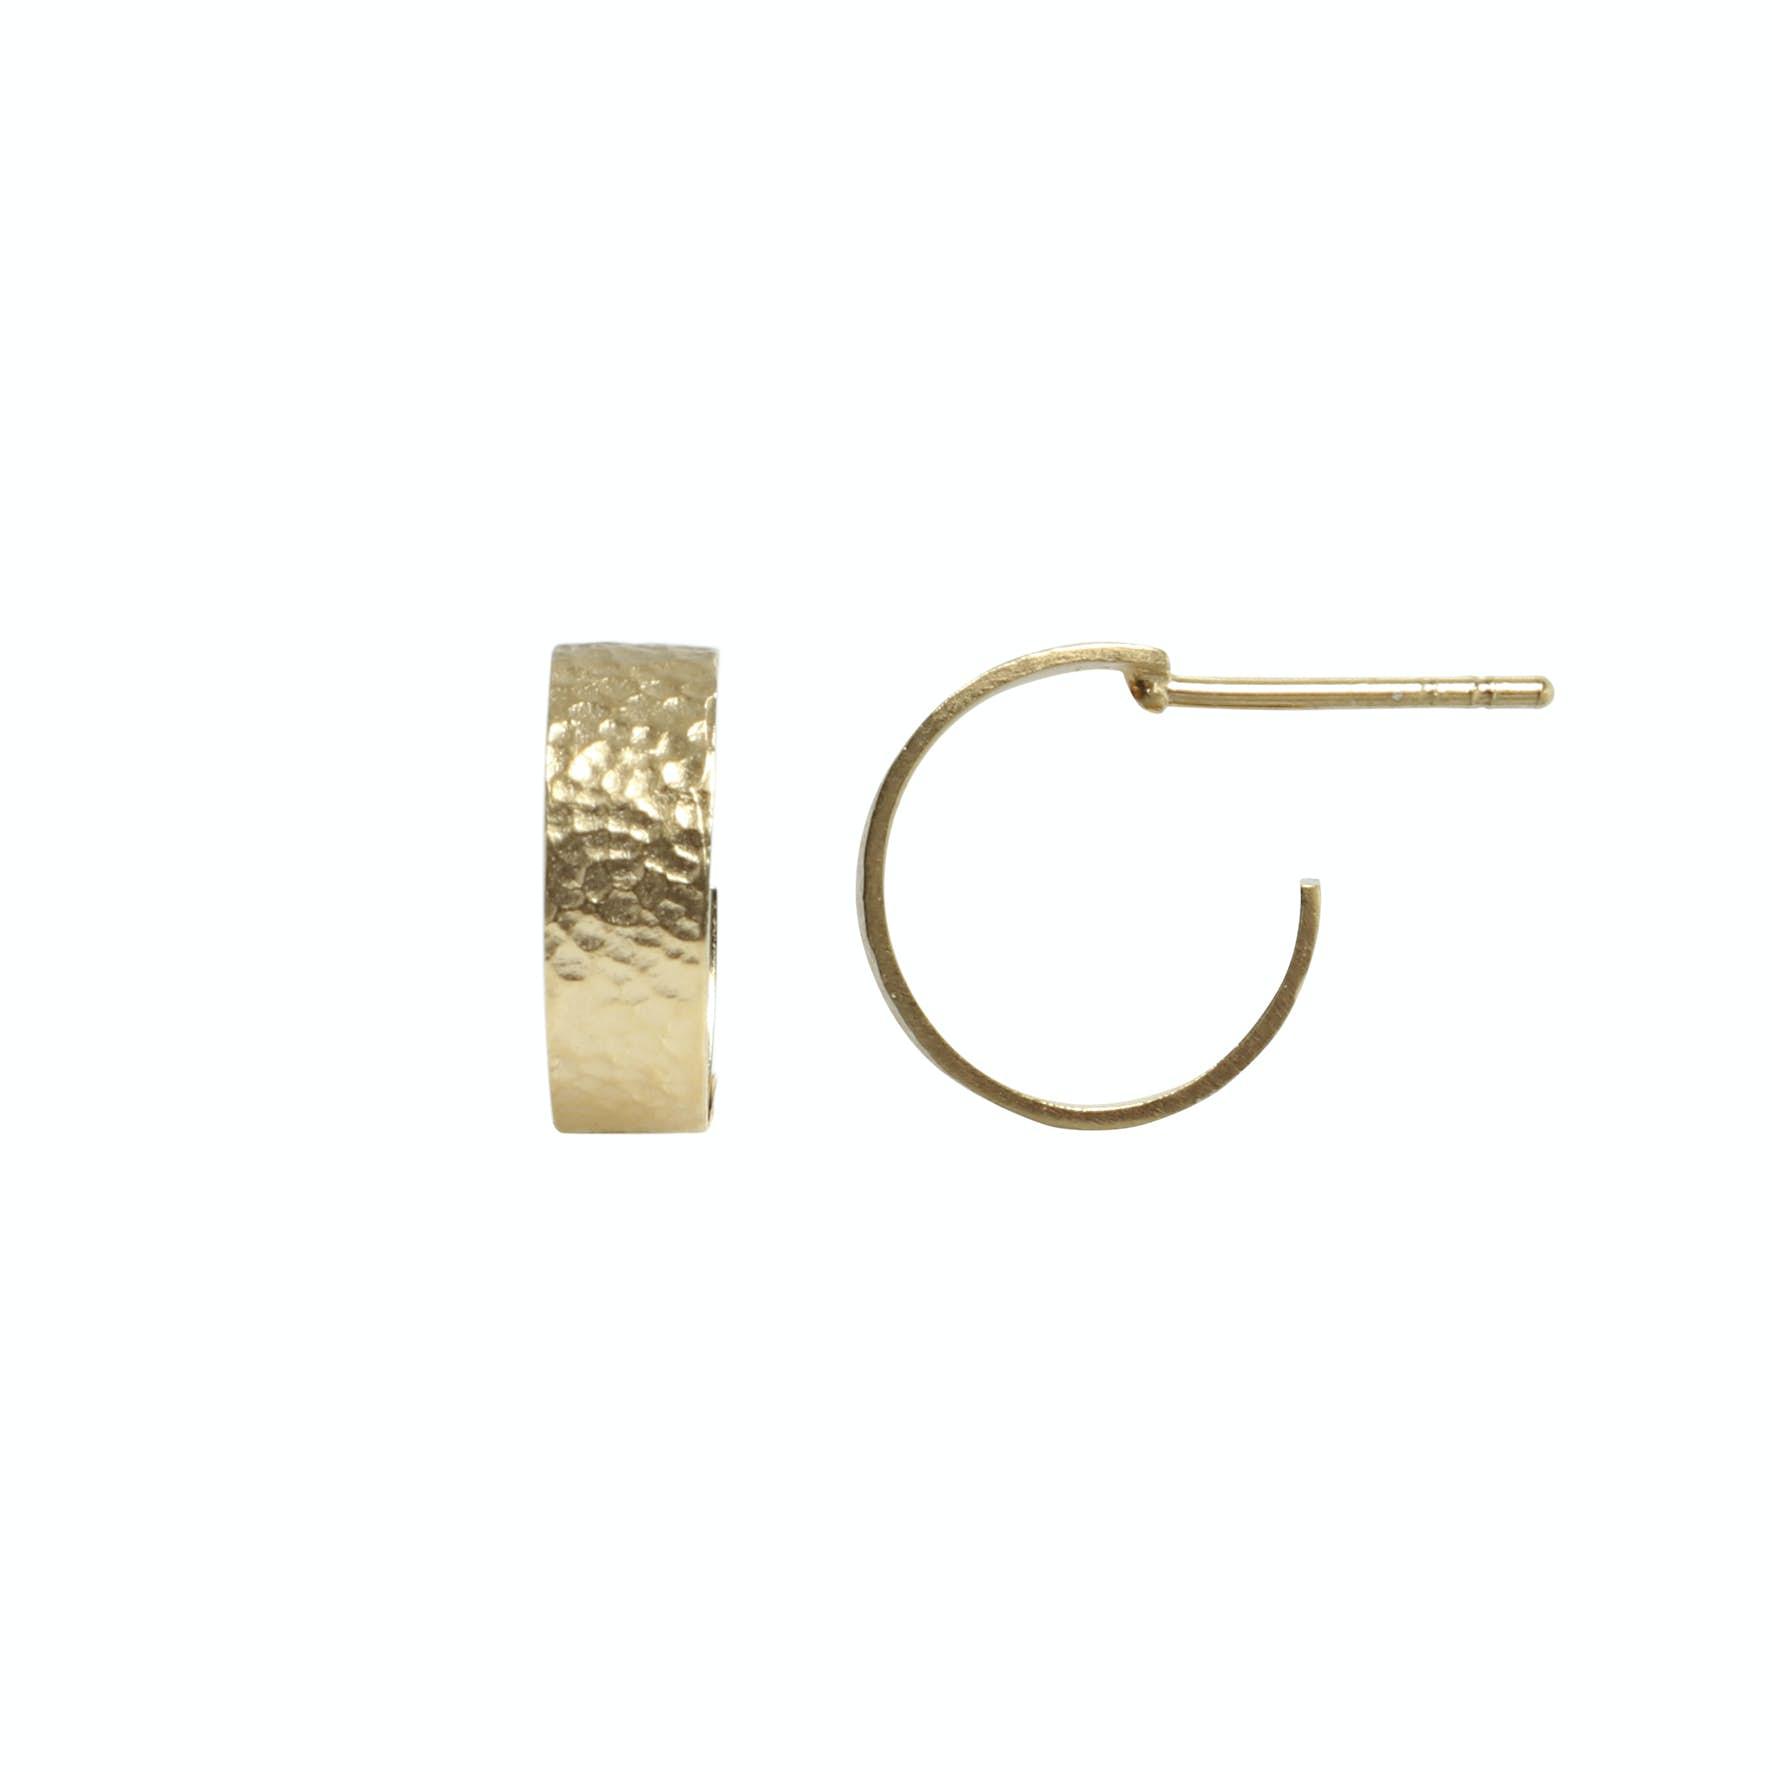 Petit La Mer Creol von STINE A Jewelry in Vergoldet-Silber Sterling 925